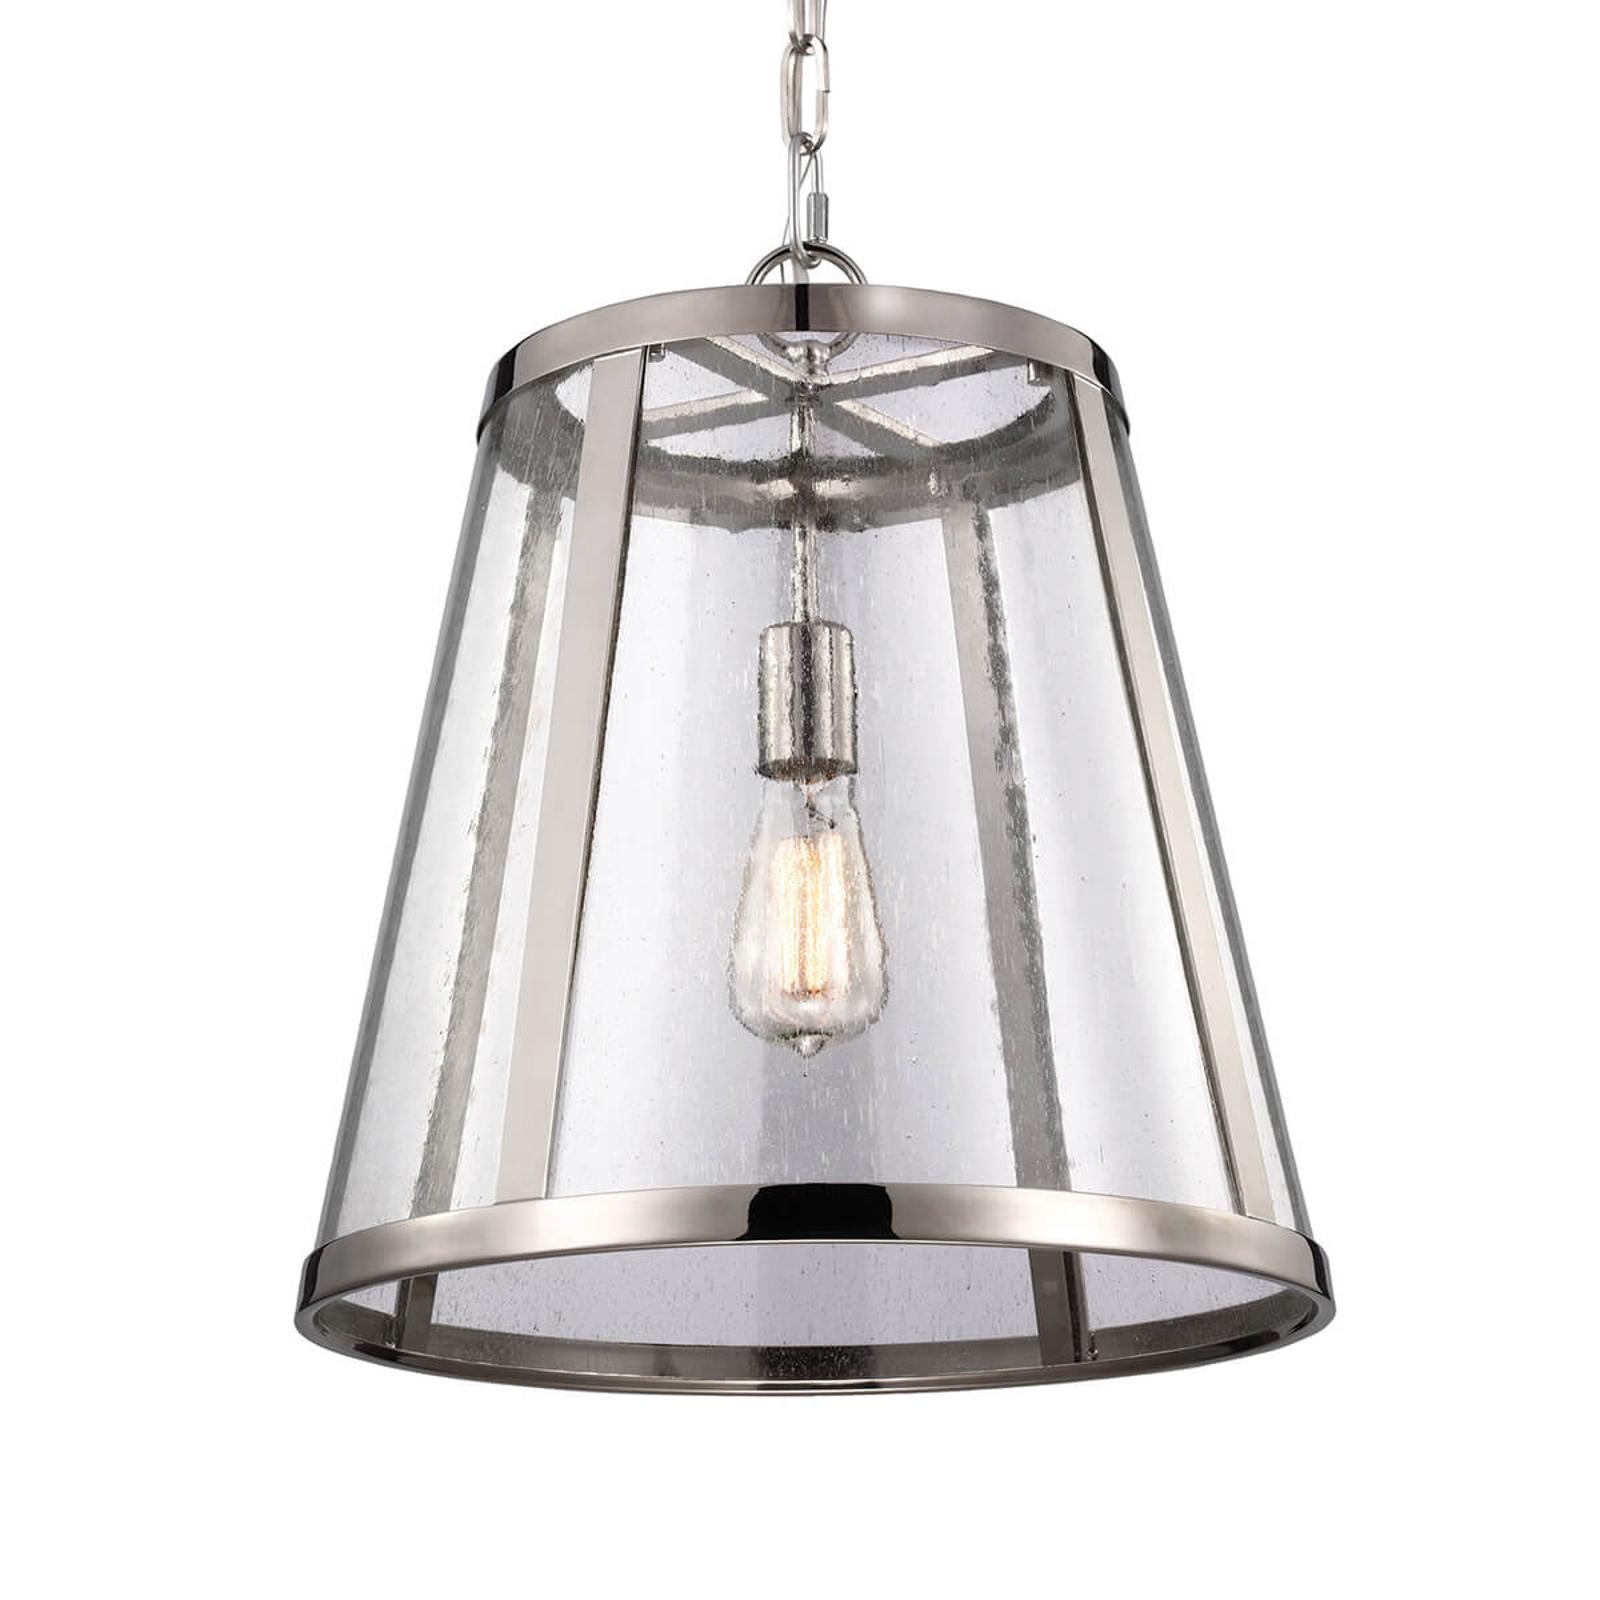 Met kettingafhanging - hanglamp Harrow